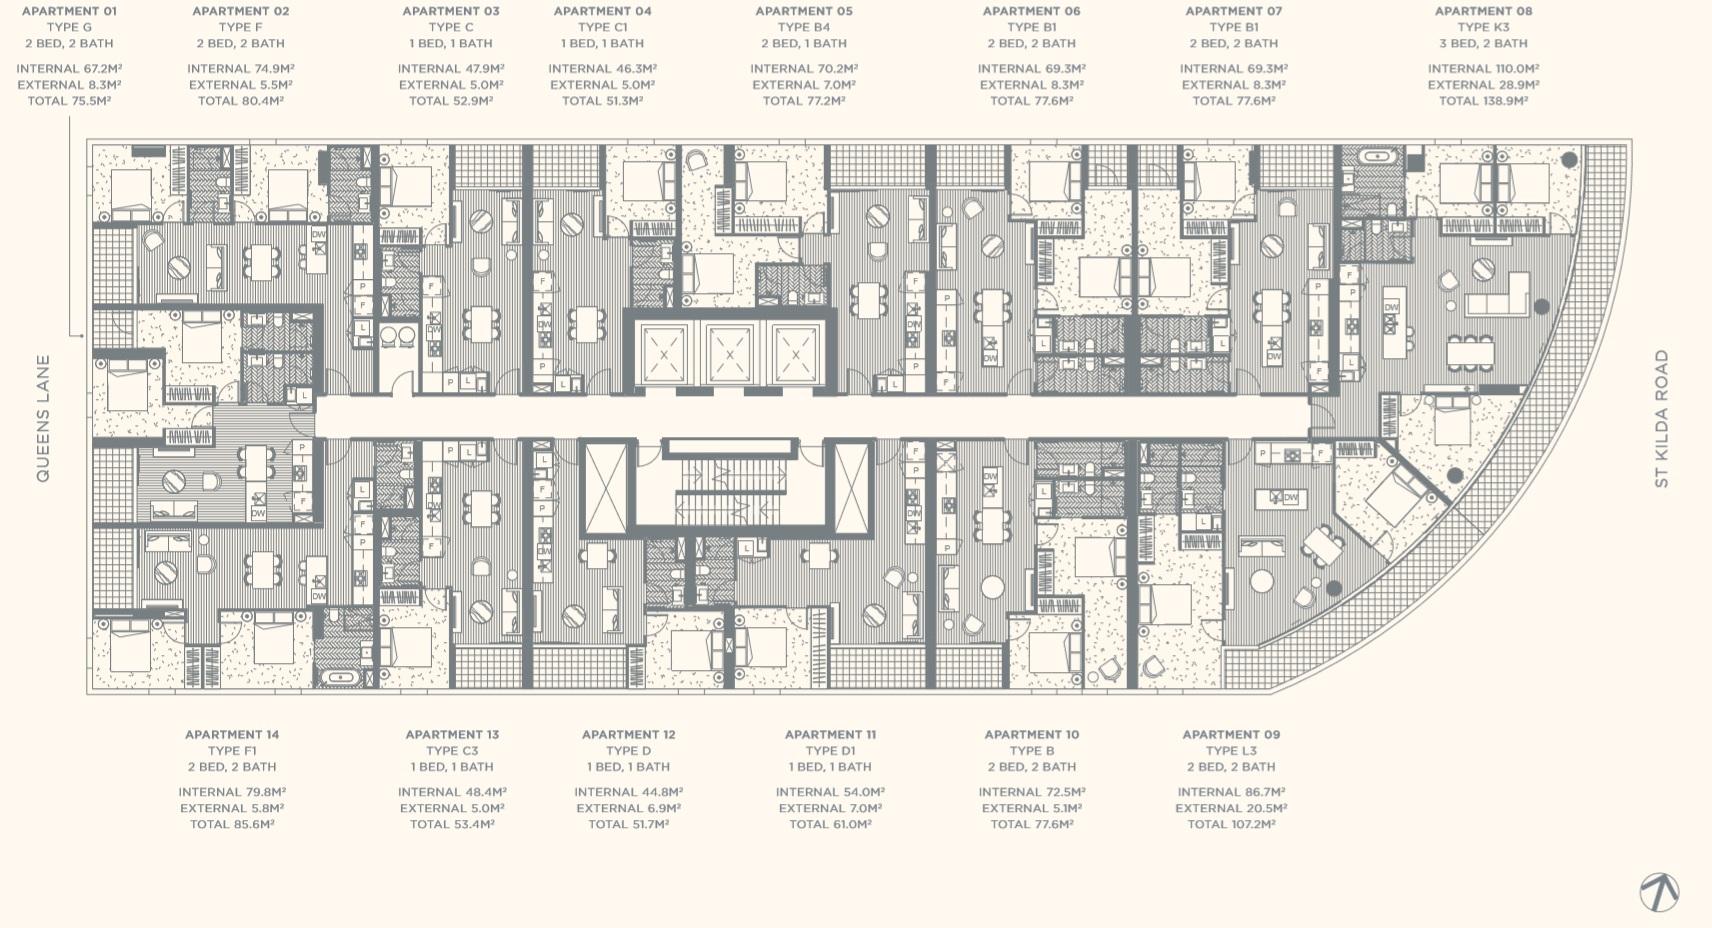 Floor Plate Level 13-15